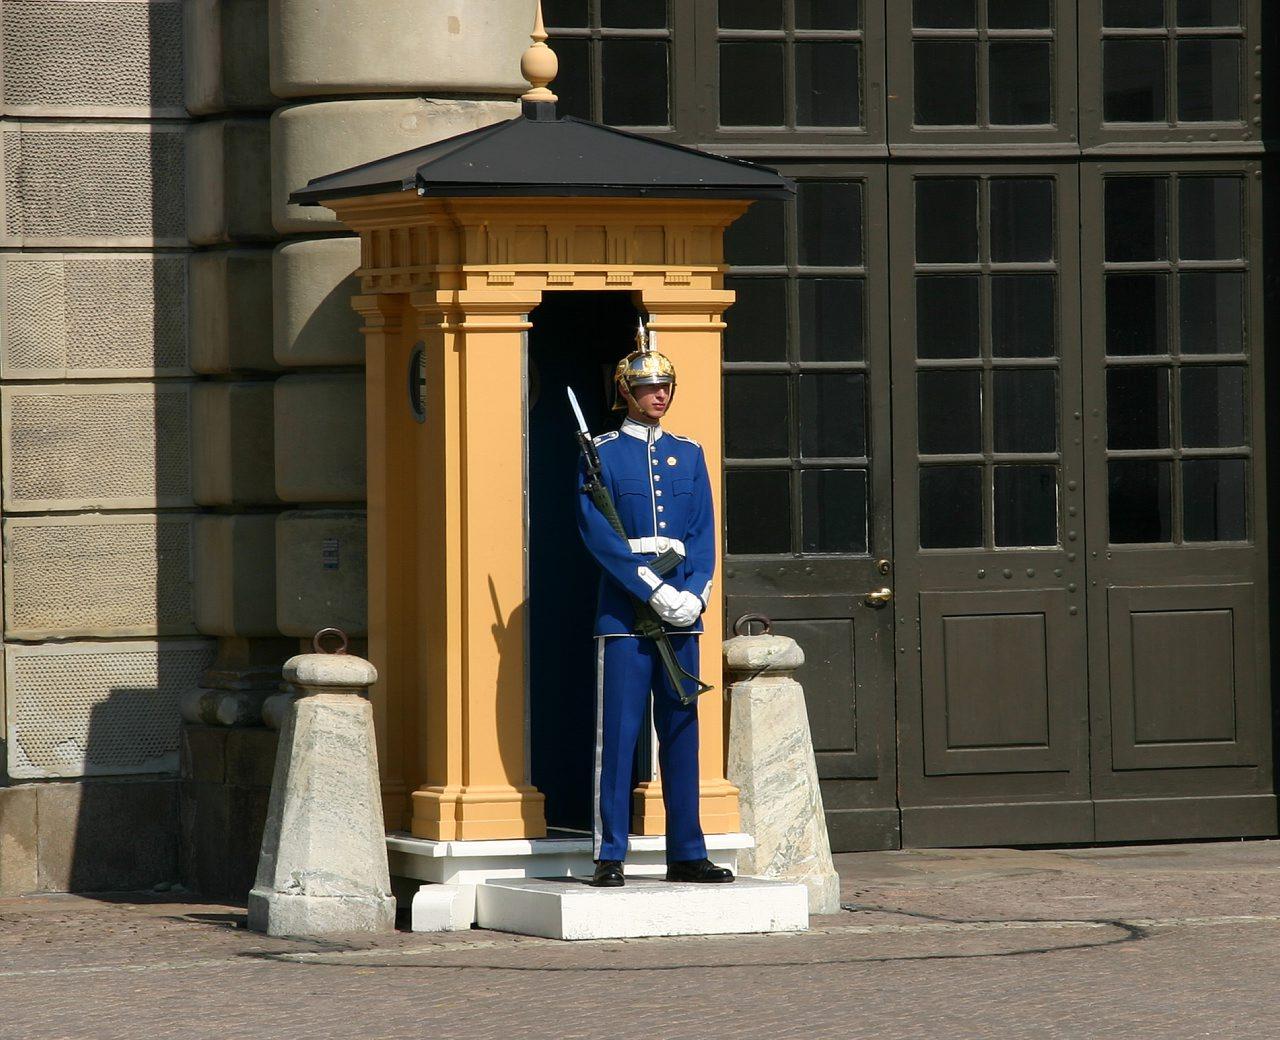 http://www.tunliweb.no/Bilder_SM/_album_stockholm/a4.jpg